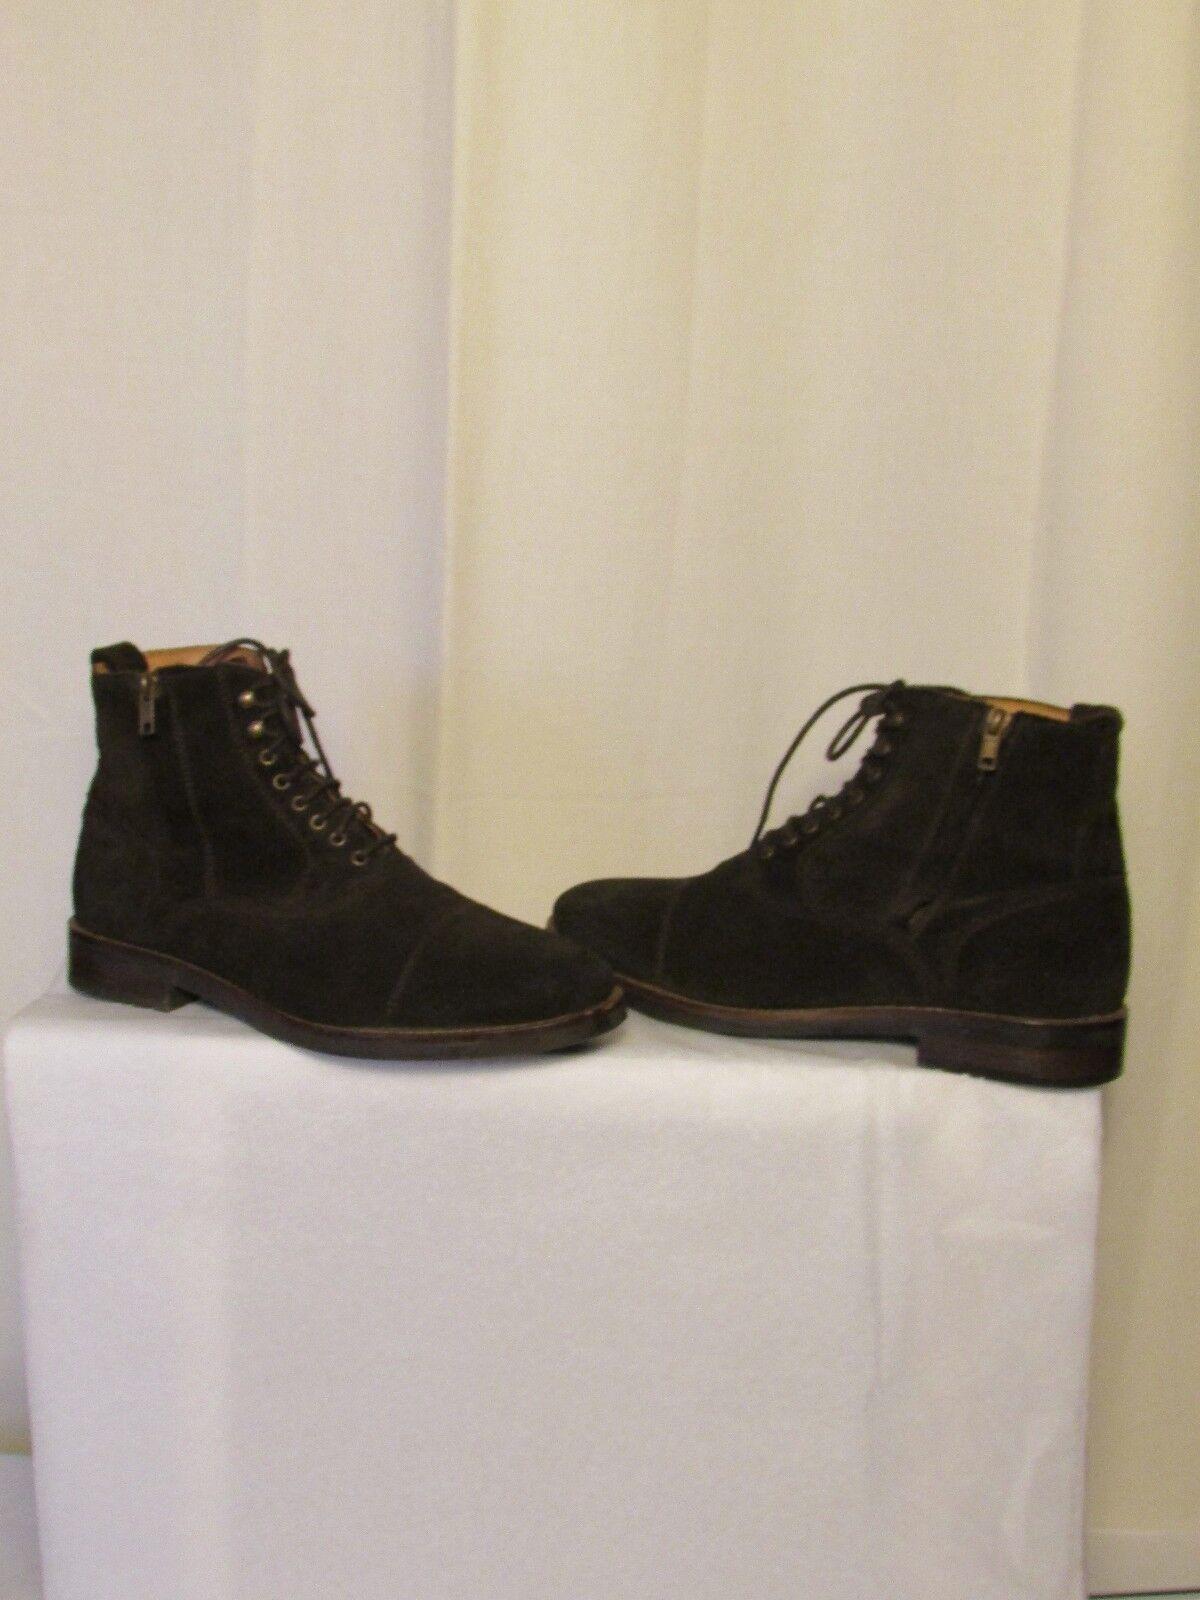 Boots/bottines Massimo Dutti daim marron 42